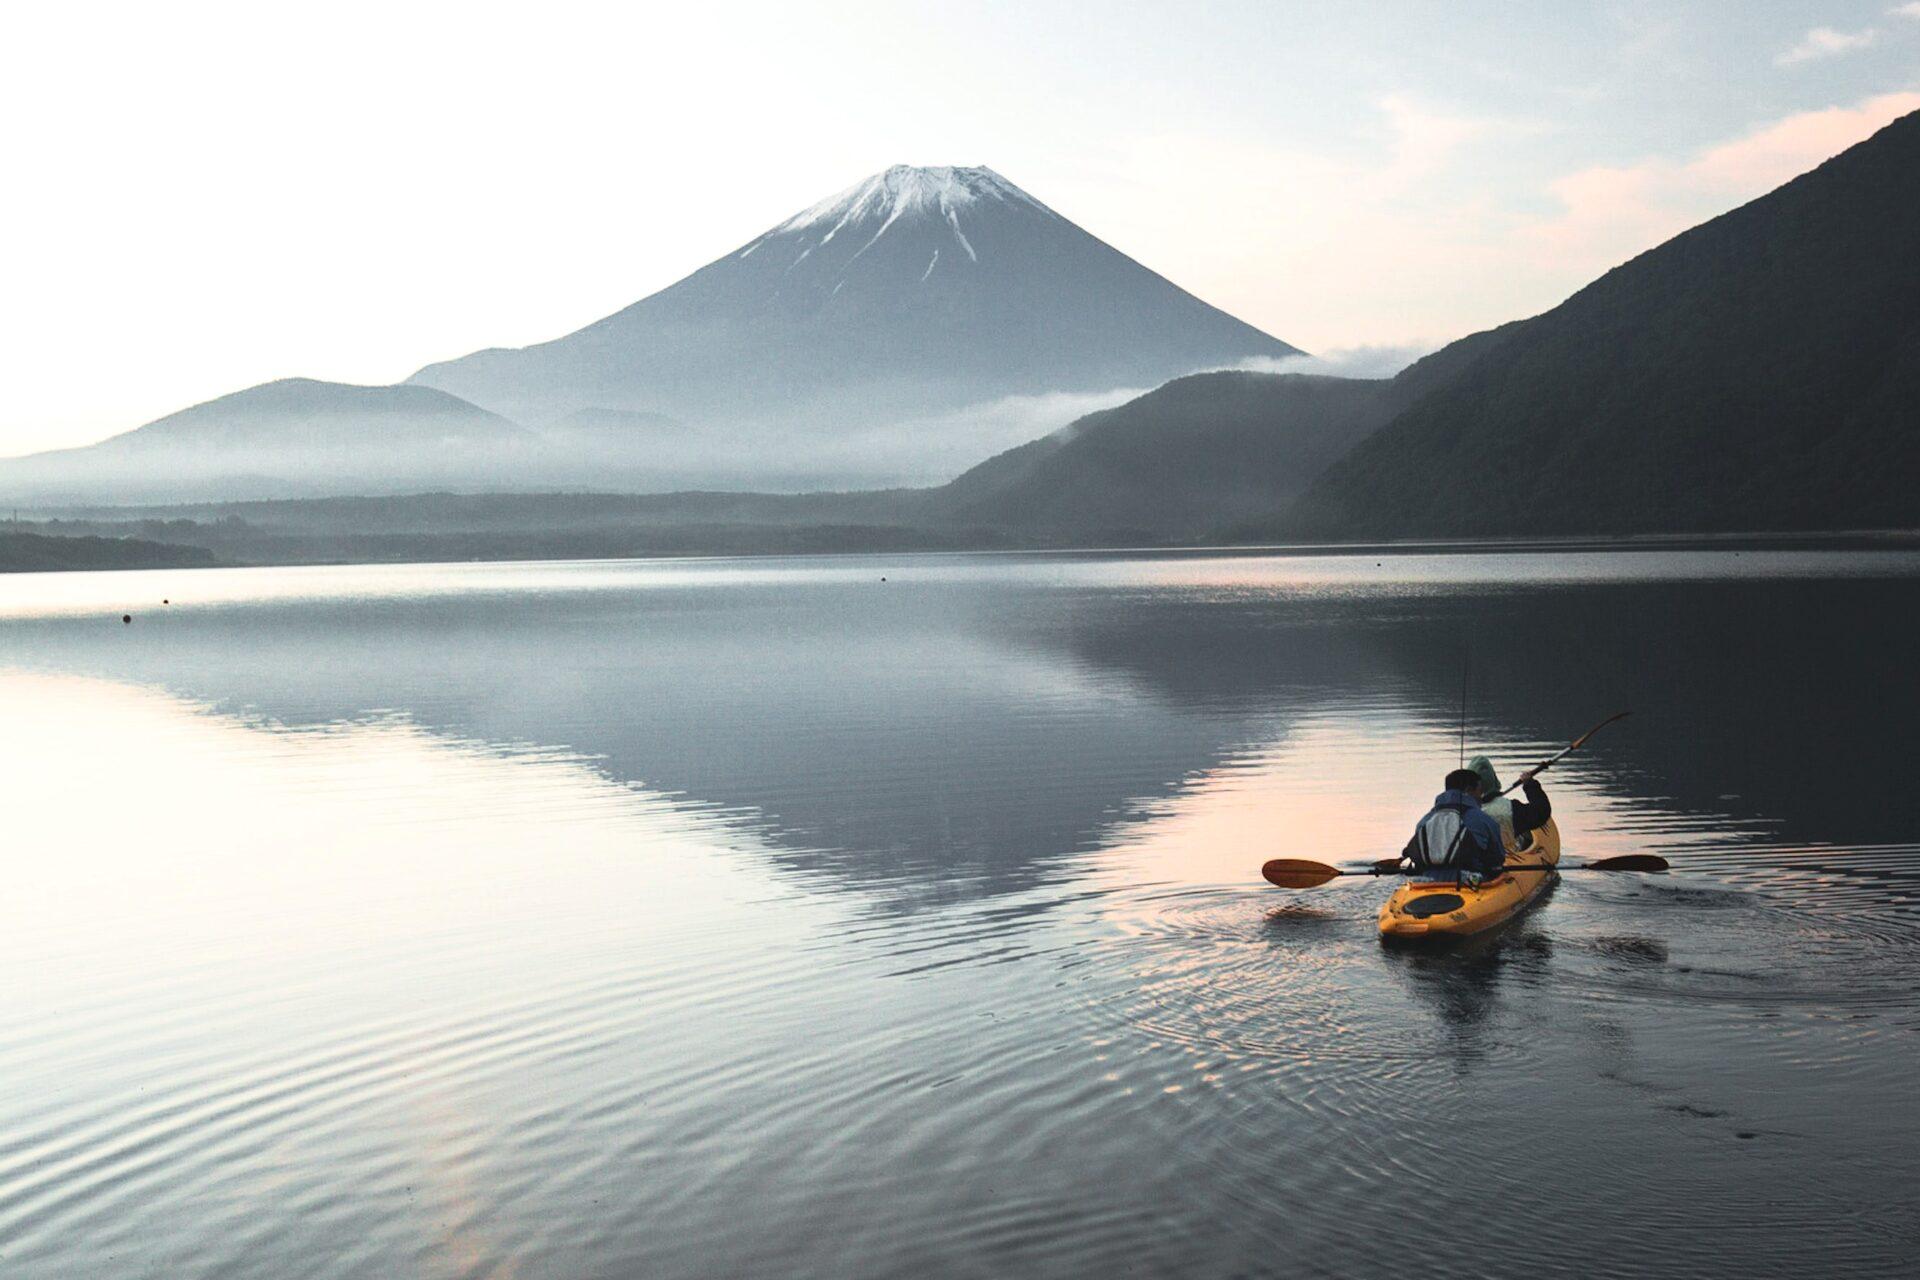 Mt. Fuji activities kayaking